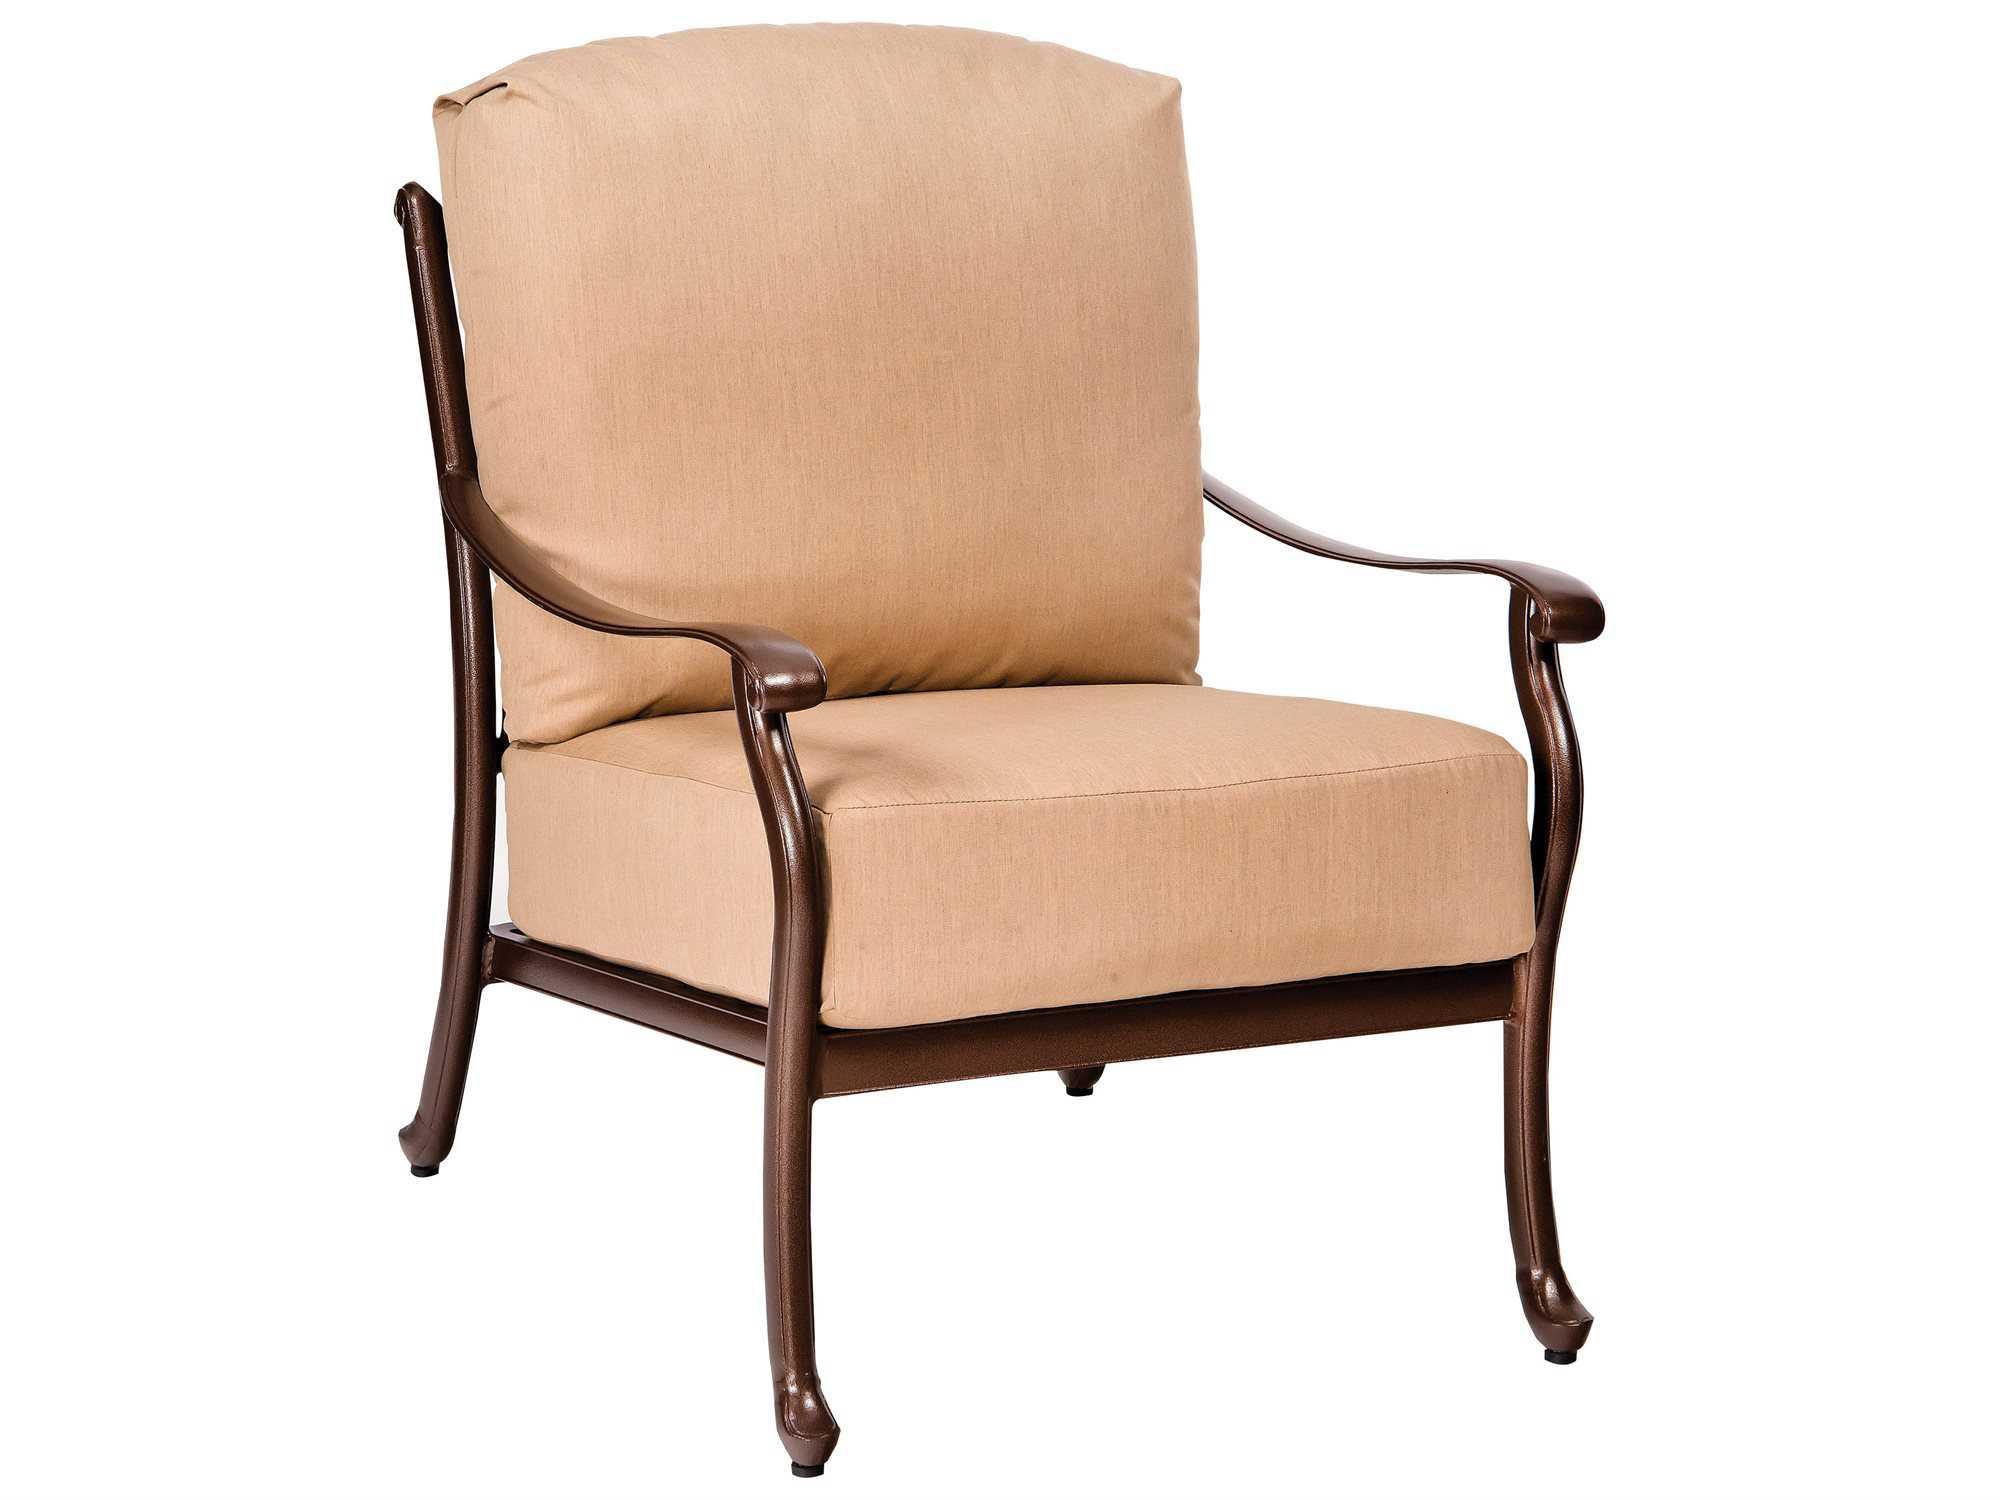 Woodard Casa Lounge Chair Replacement Cushions